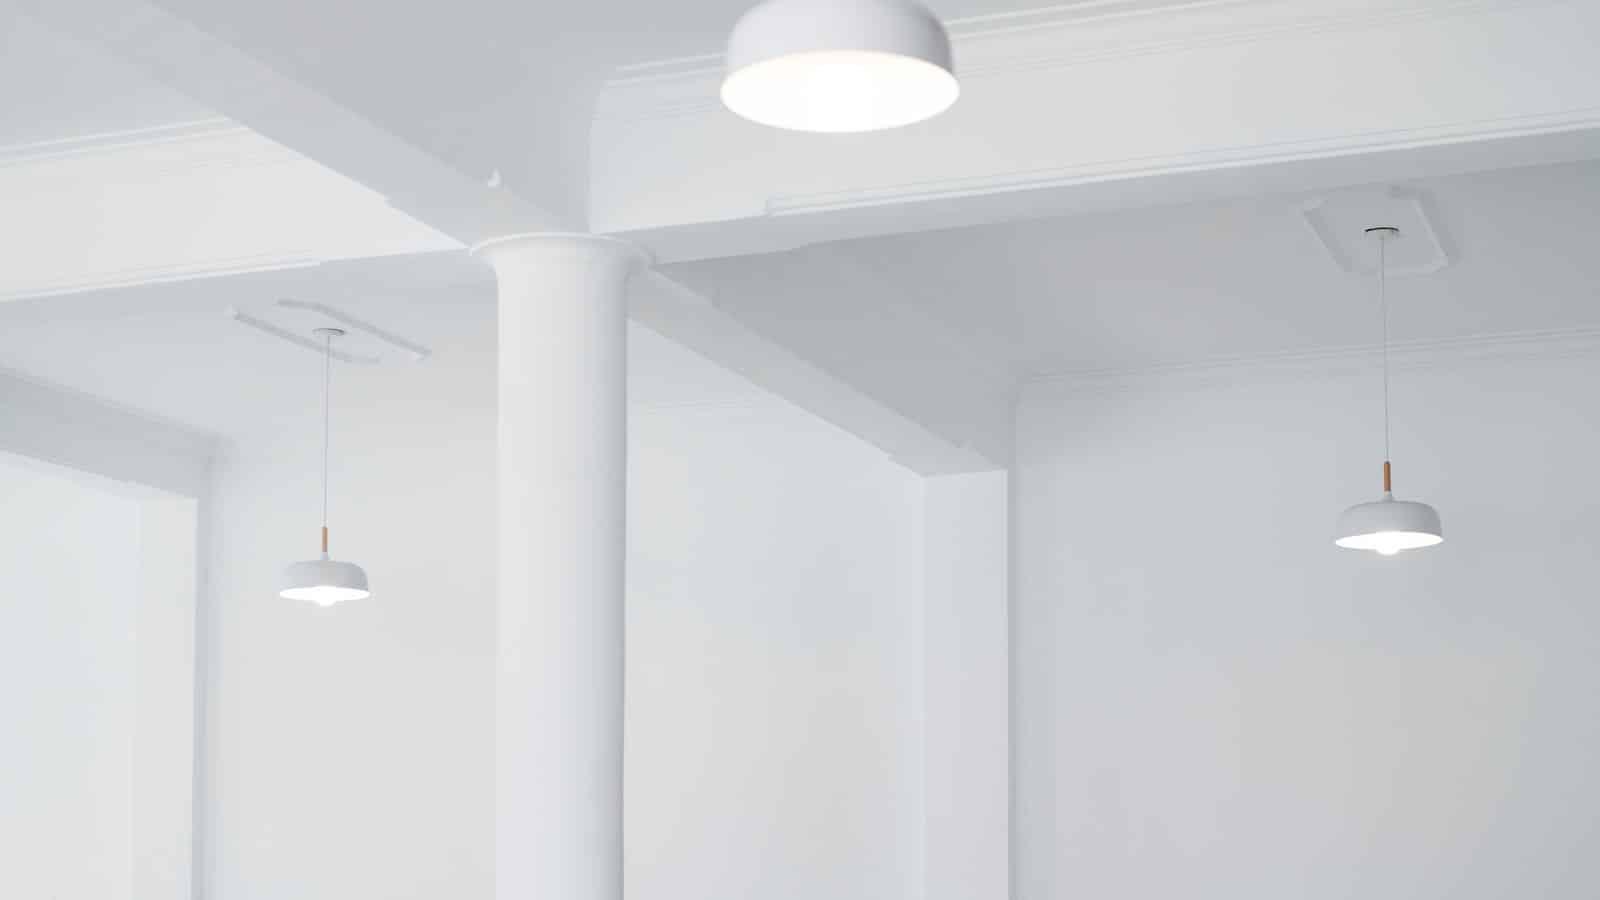 Plafond repeint en blanc